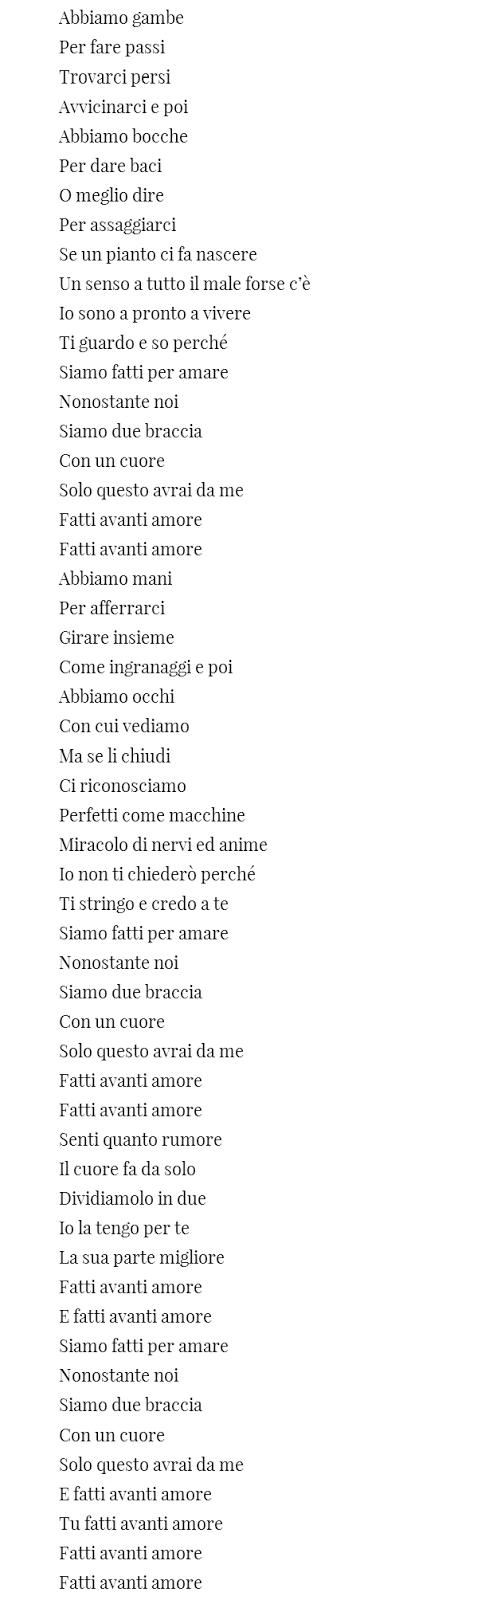 lyrics translation Fatti avanti amore Nek testo Sanremo 2015